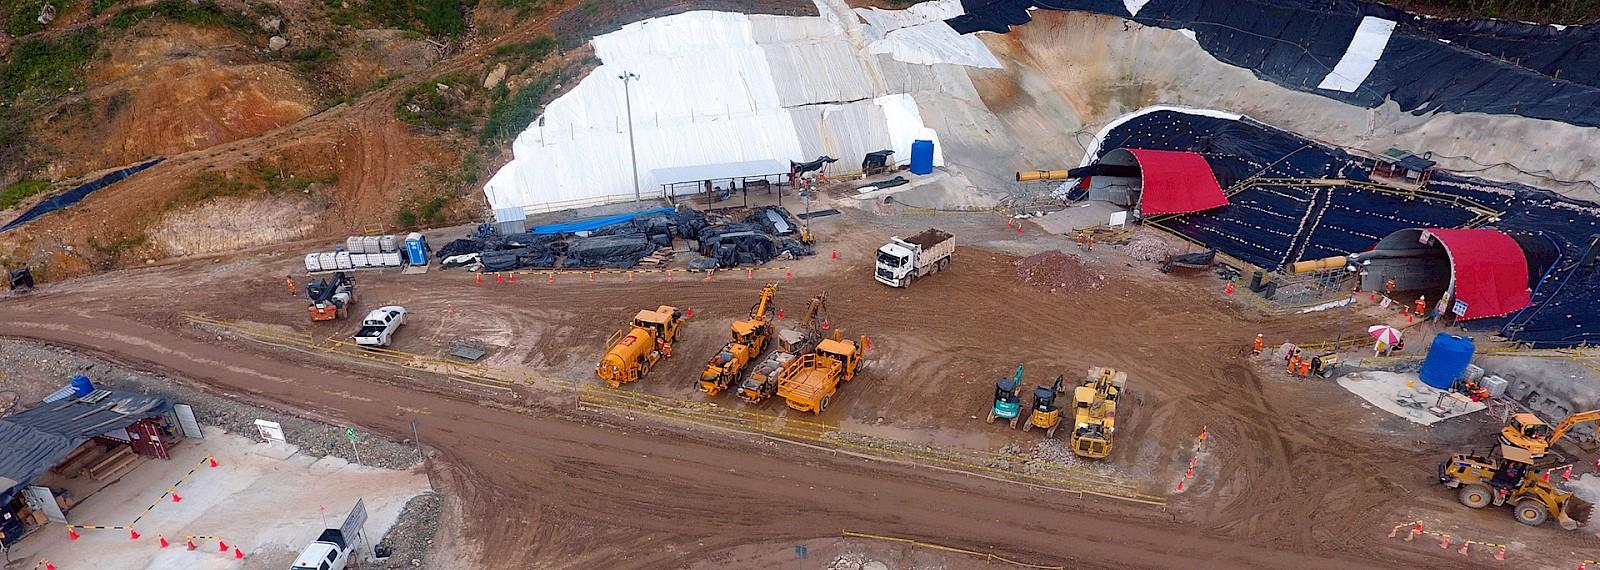 Lundin Gold Closes Usd 350 Million Senior Debt Facility And